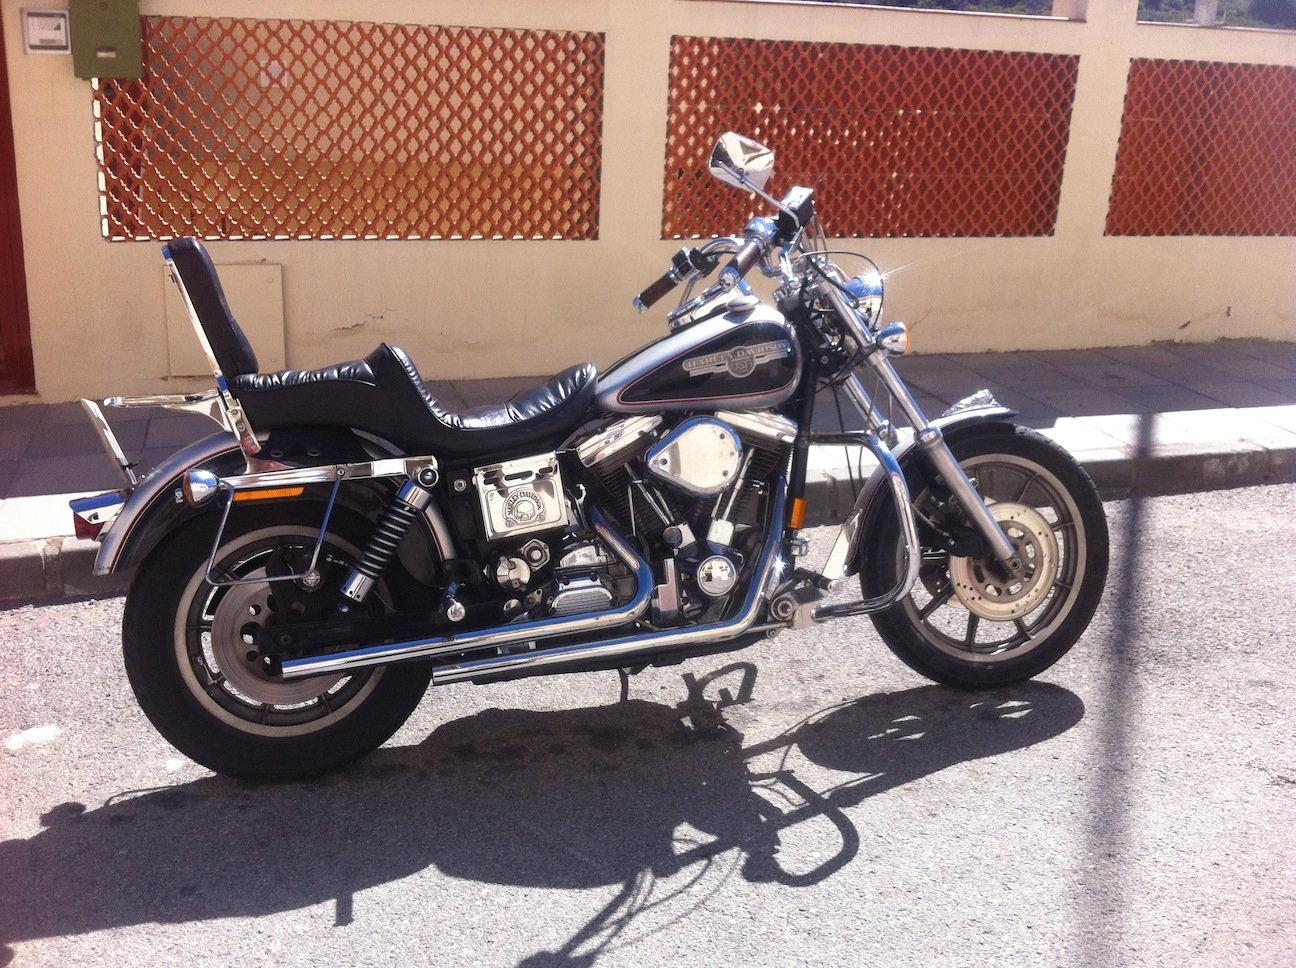 Misfiring 1992 FXDC - Harley Davidson Forums